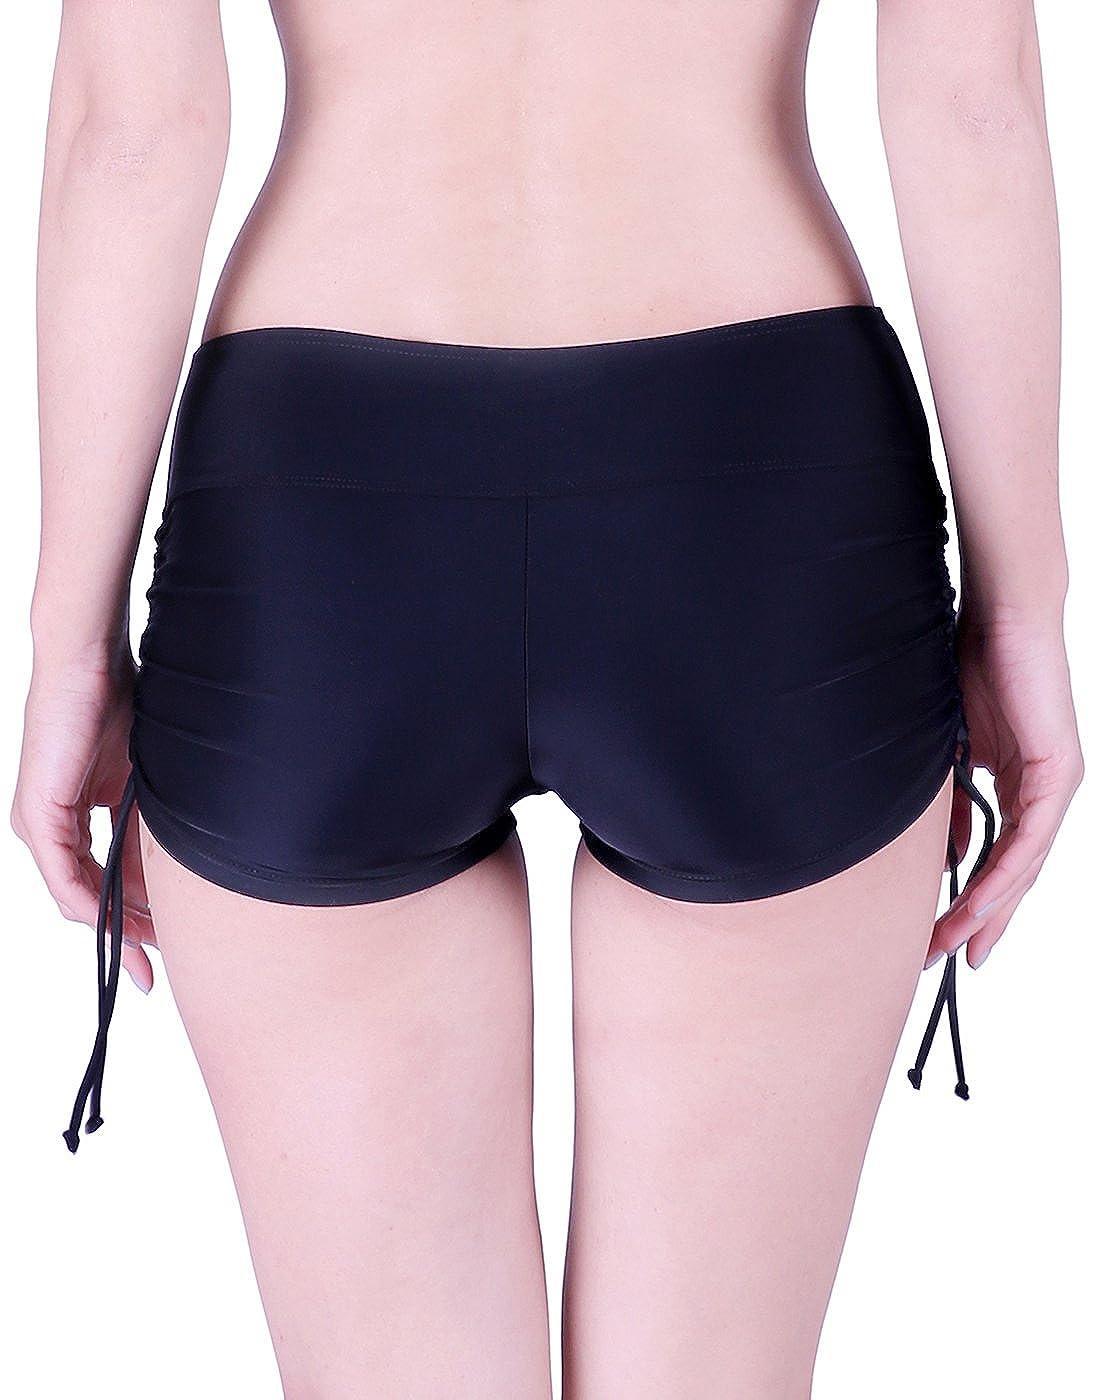 1f0abcb9f79 Amazon.com  HDE Womens Swim Brief with Ties Mini Boy Short Bikini Bottoms  Swimsuit Separates  Clothing